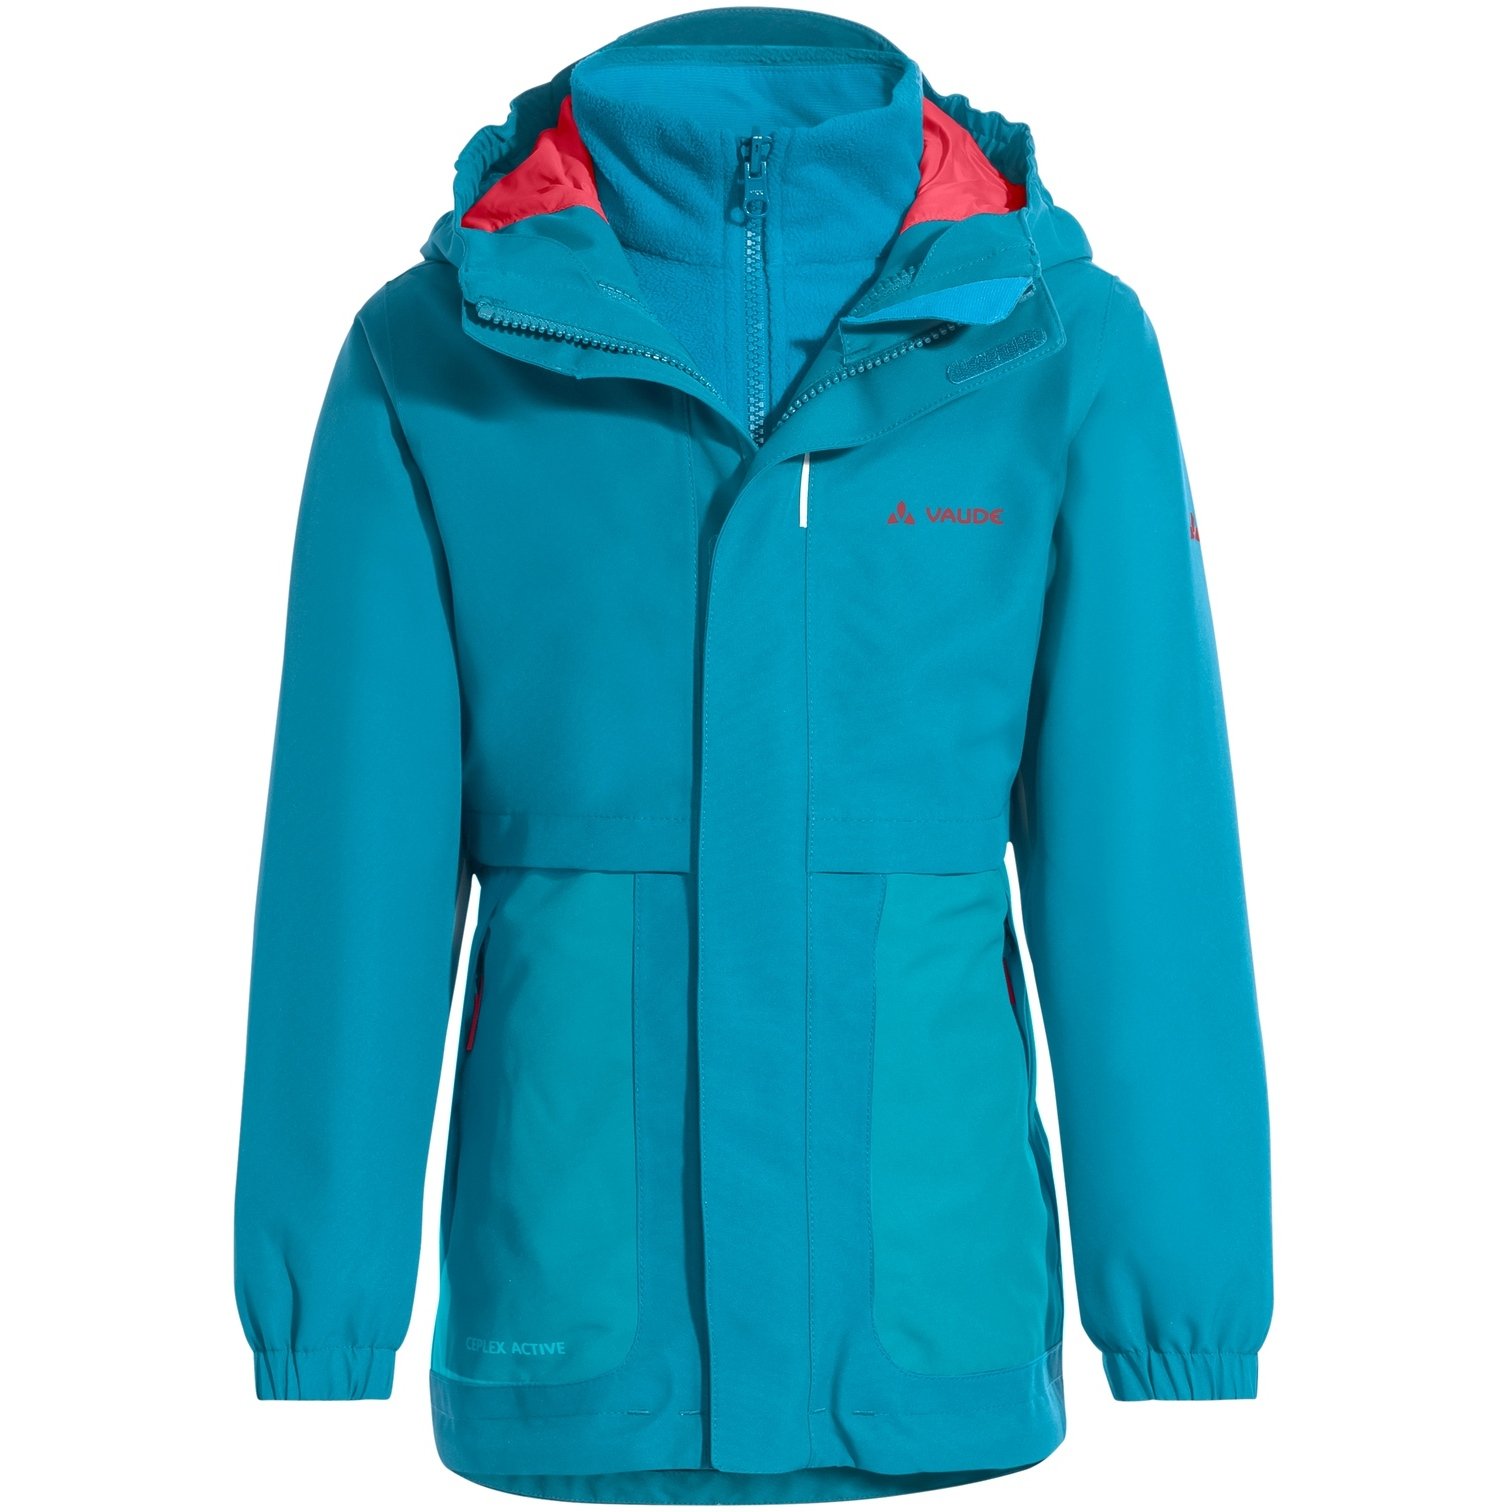 Vaude Kids Campfire 3in1 Jacket Girls - arctic blue